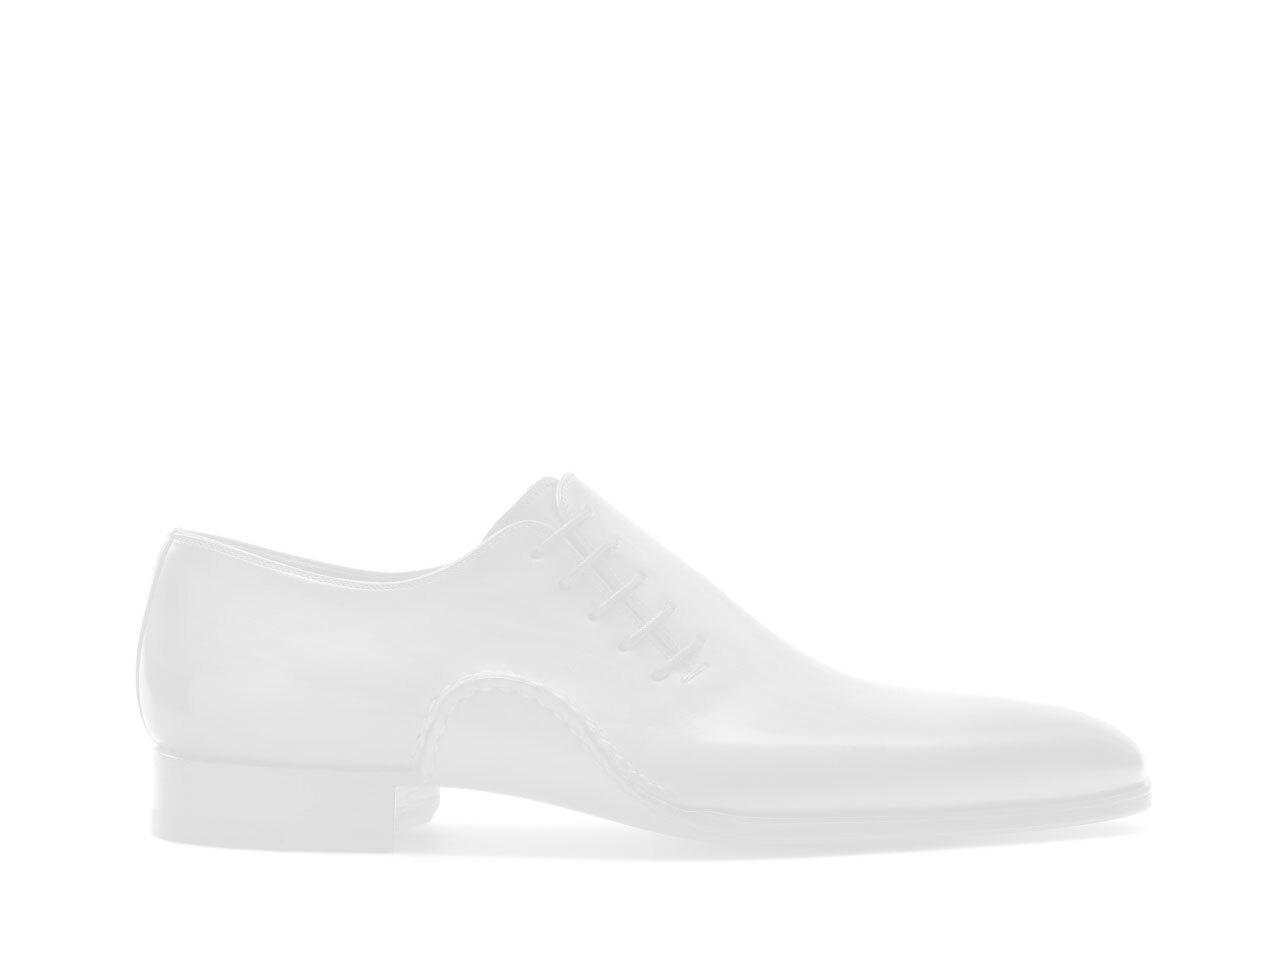 Pair of the Magnanni Allariz Midbrown Men's Sneakers